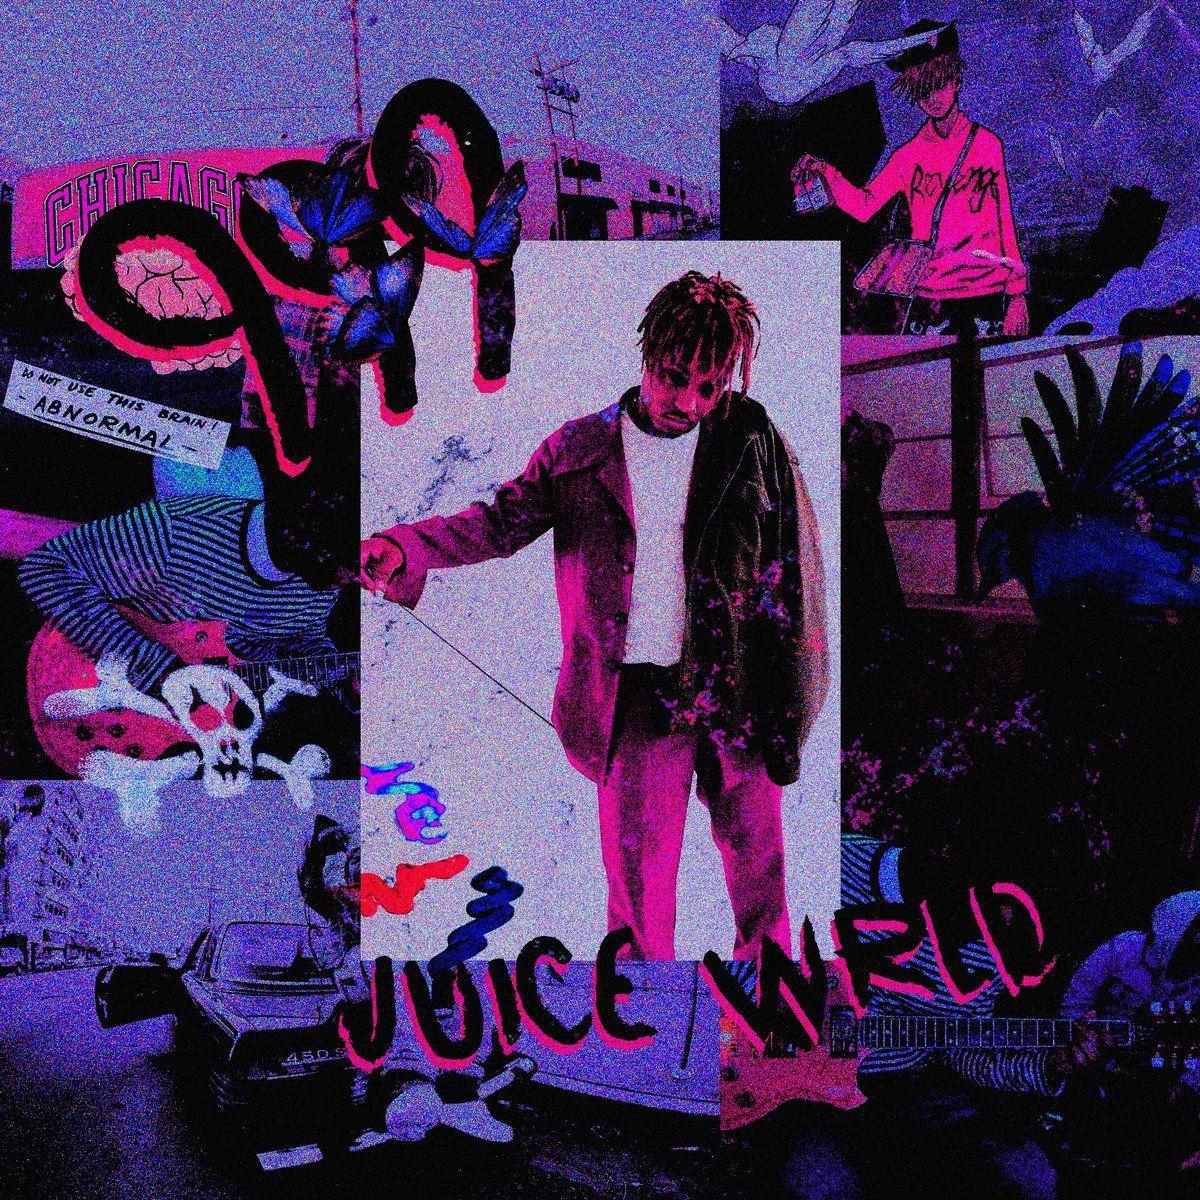 Juice WRLD Wallpaper HD 4k